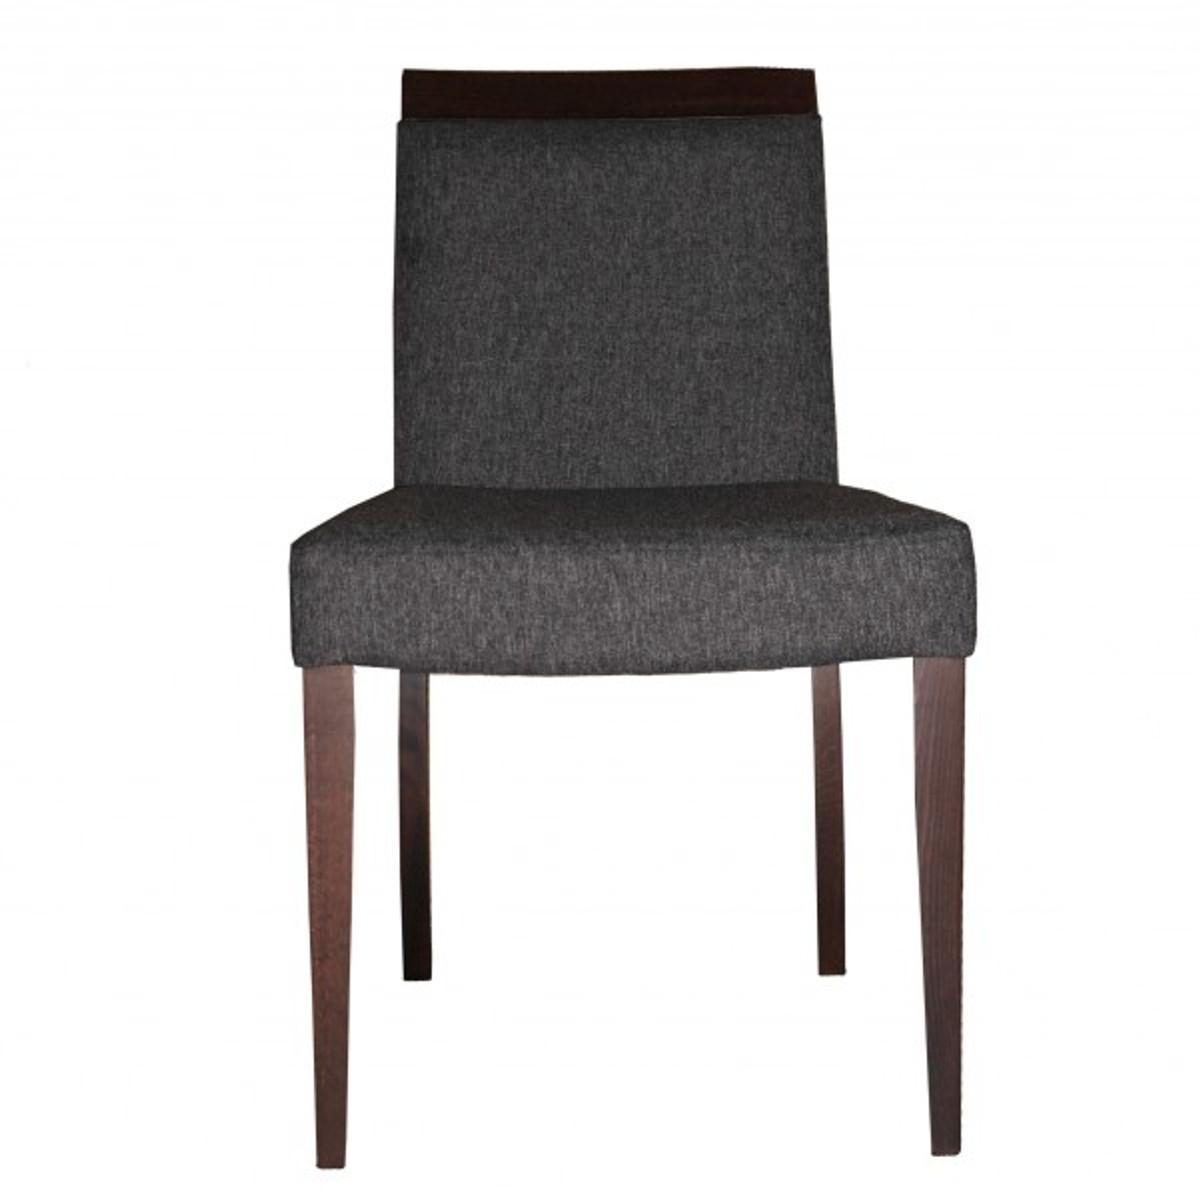 casa padrino barock esszimmer stuhl grau braun m bel restaurant hotel casa padrino. Black Bedroom Furniture Sets. Home Design Ideas